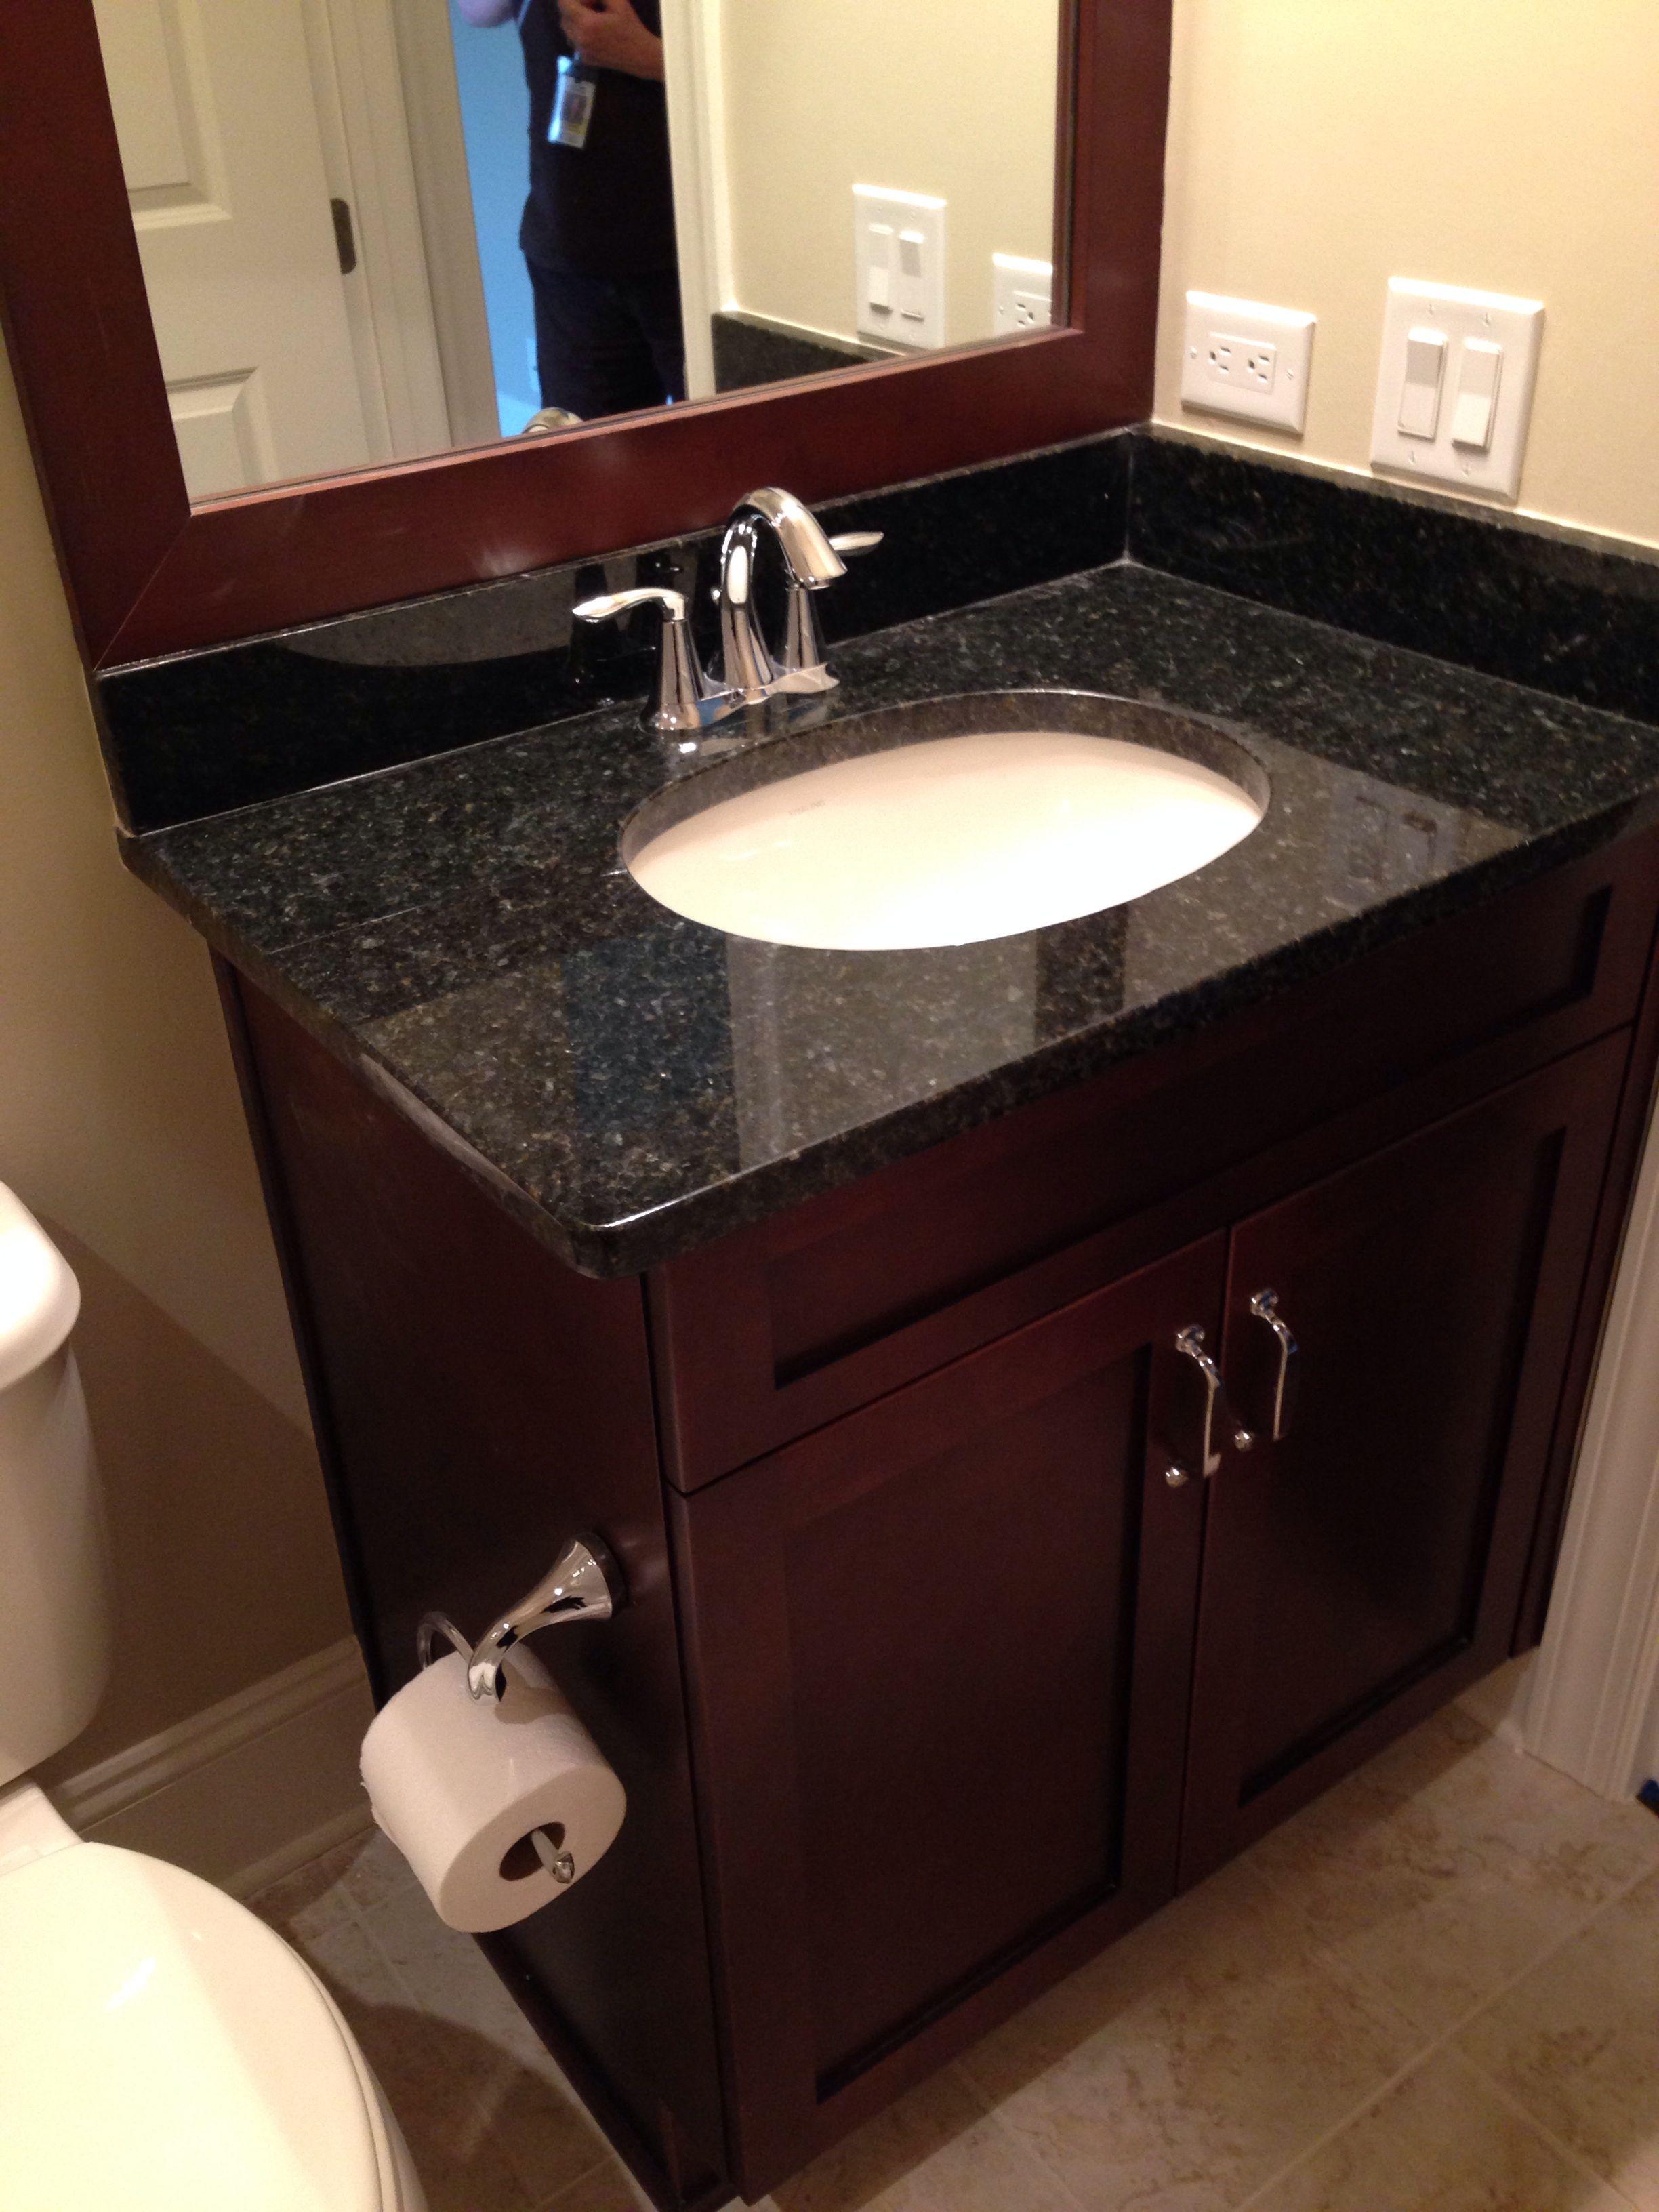 Secondary Bath 13 Bc93 Washbasin Design Bathroom Cabinets Designs Cupboard Design